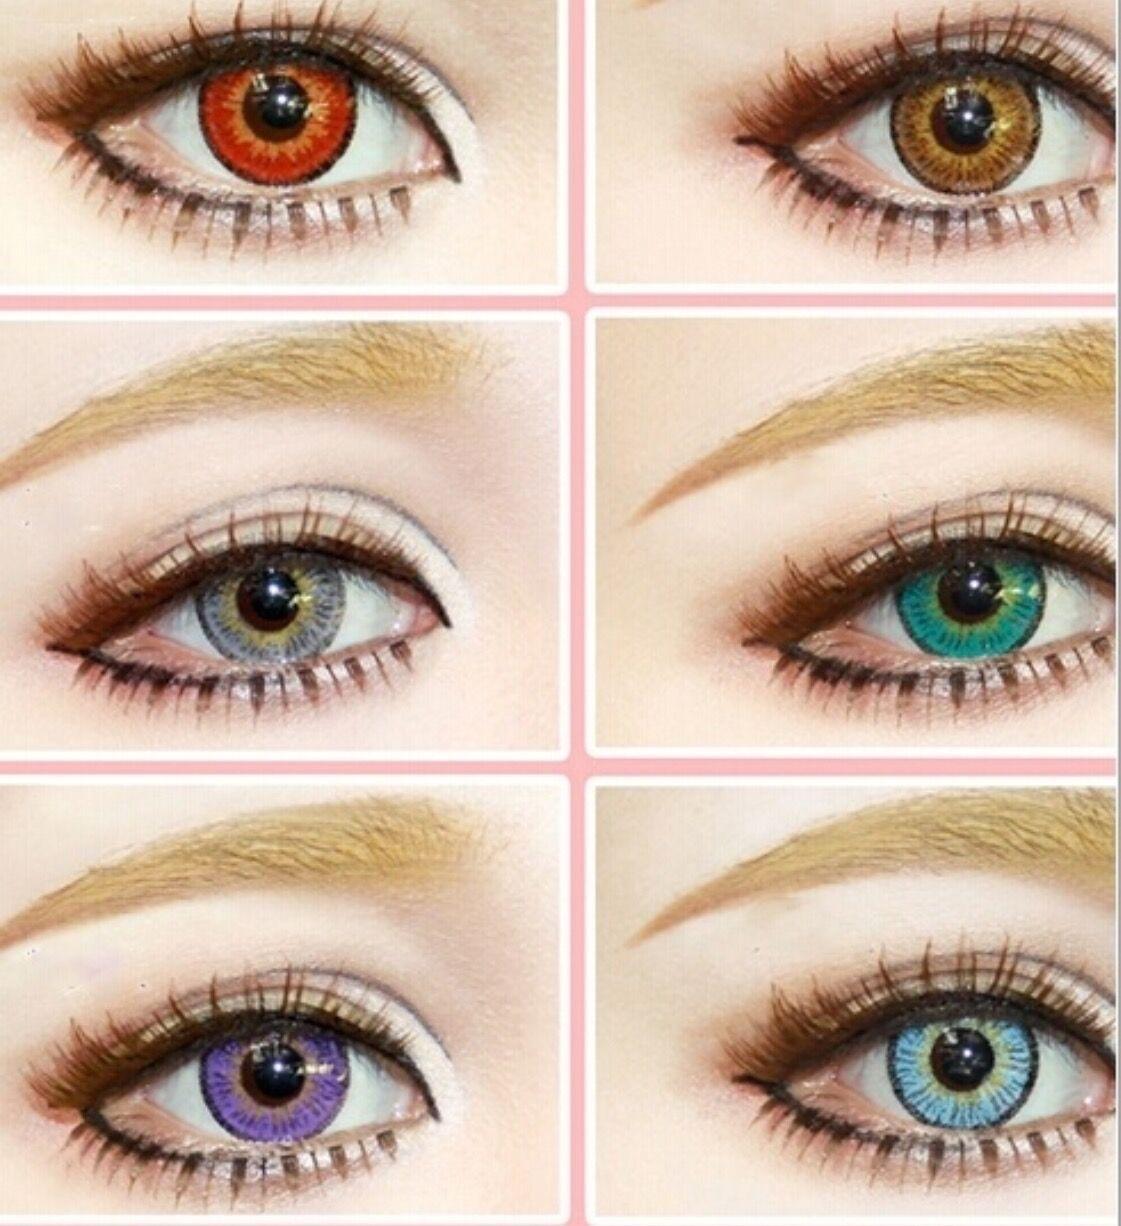 Color contact lenses online shop -  Halloween Contacts Cheap No Prescription By 100 Halloween Colored Eye Contacts Contact Lenses Costumes